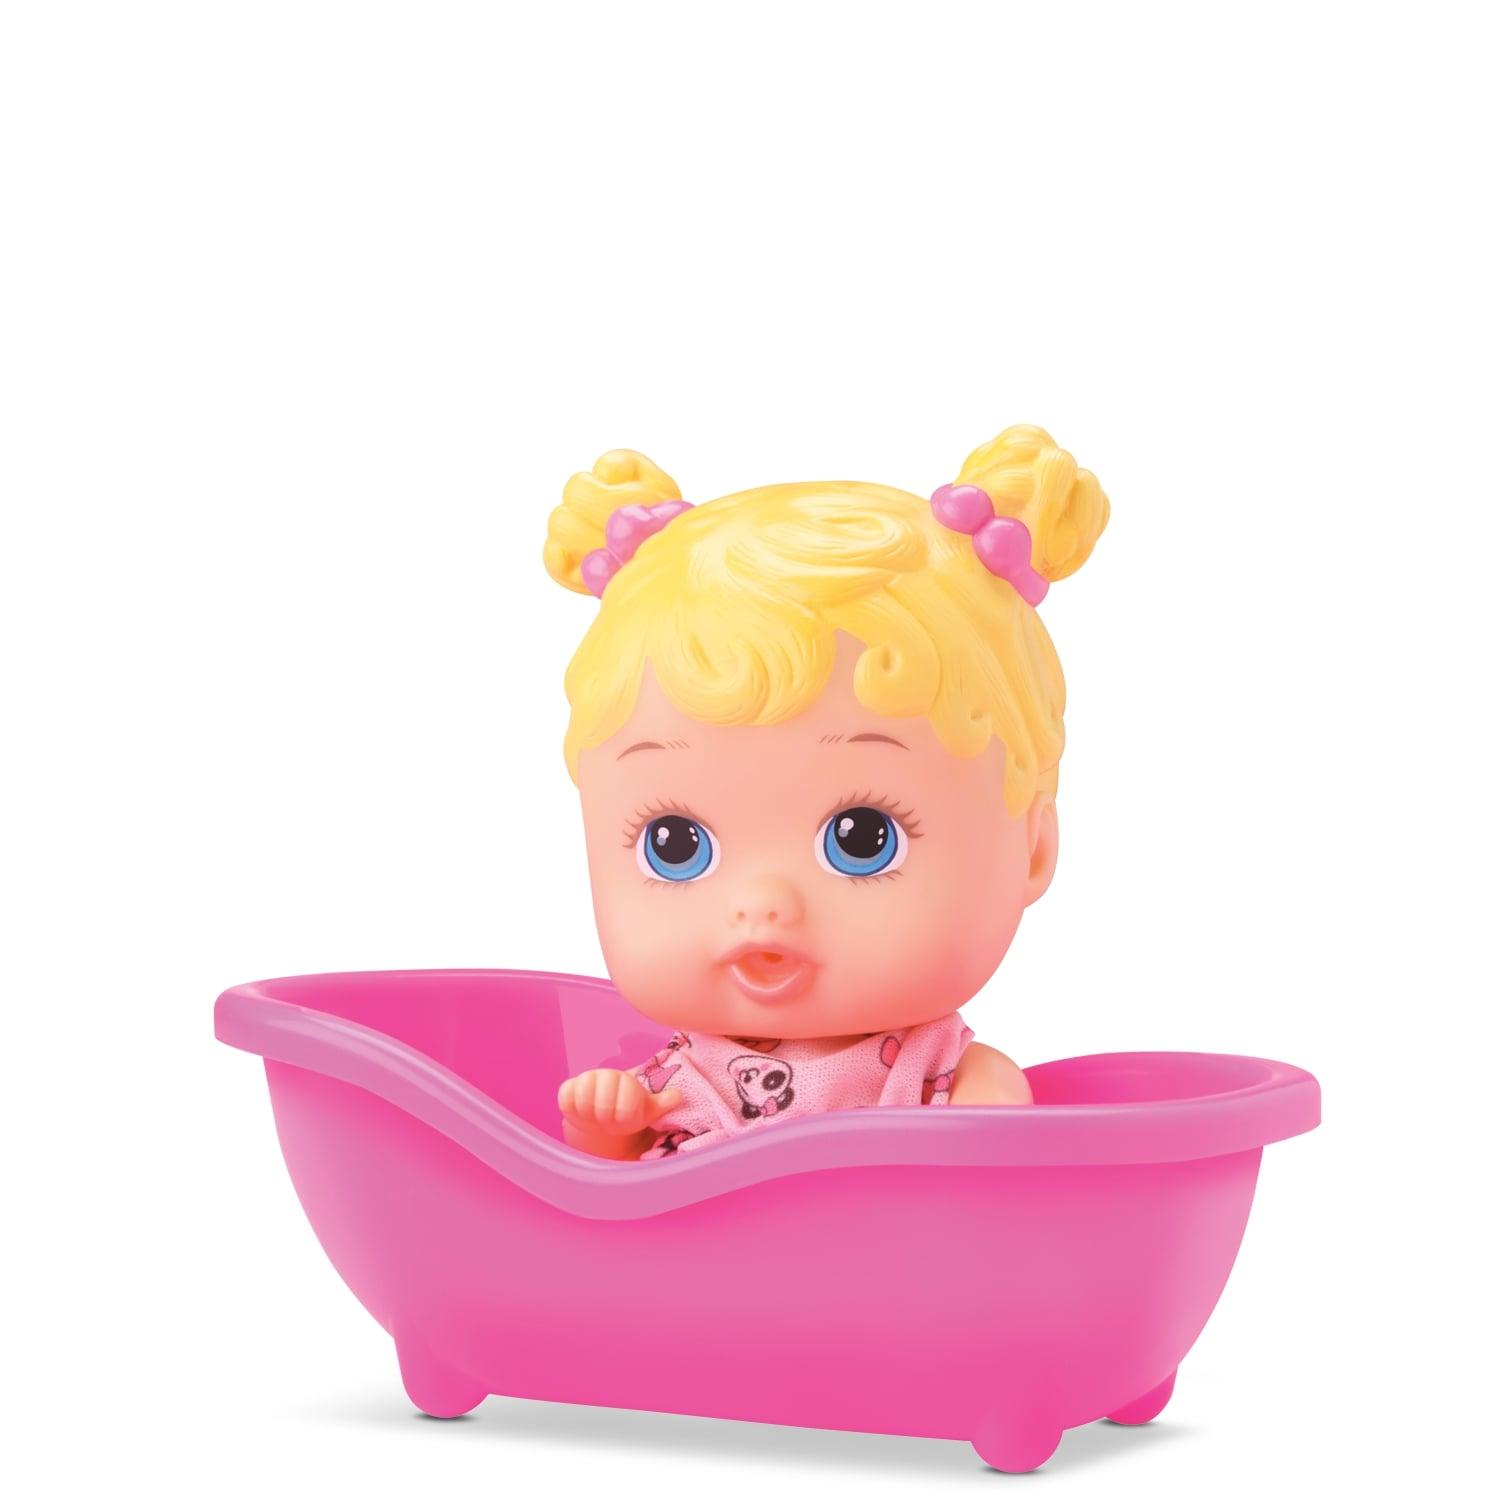 Boneca Little Dolls Banheirinha 8022 Divertoys